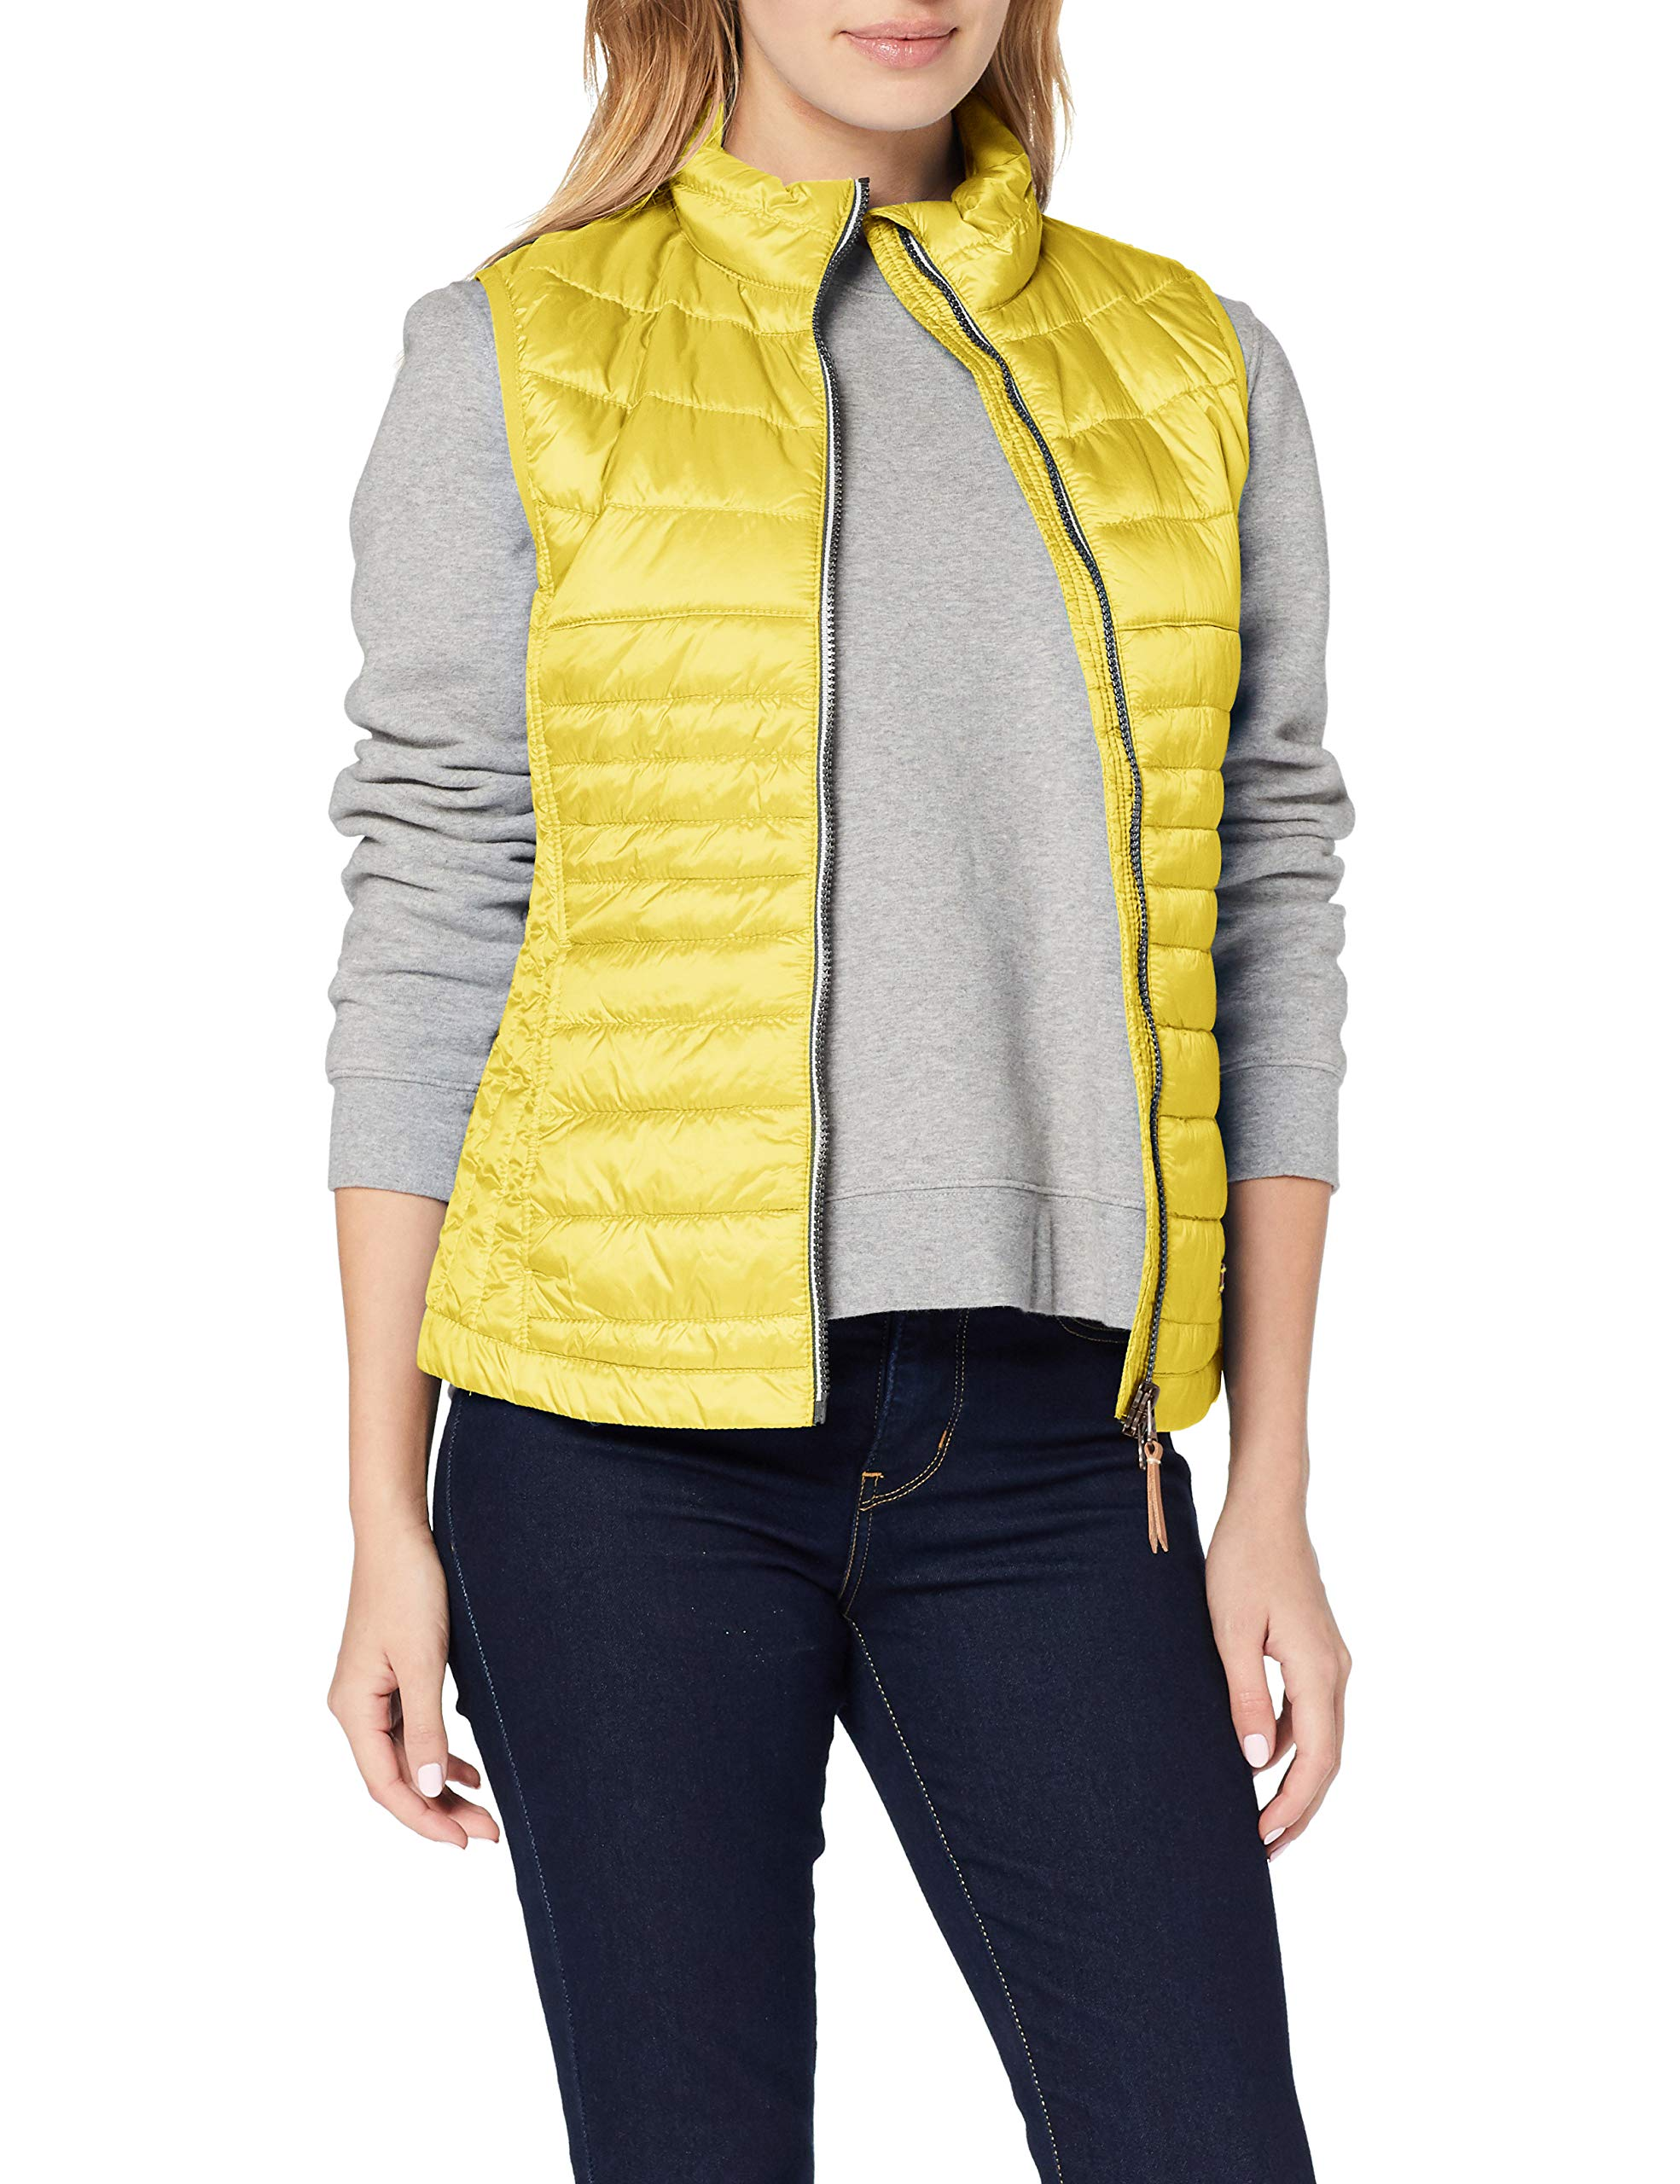 360910 ManchesJauneyellow Fabricant42Femme Active Womenswear Camel Sans Veste 6044taille 34AR5Ljq